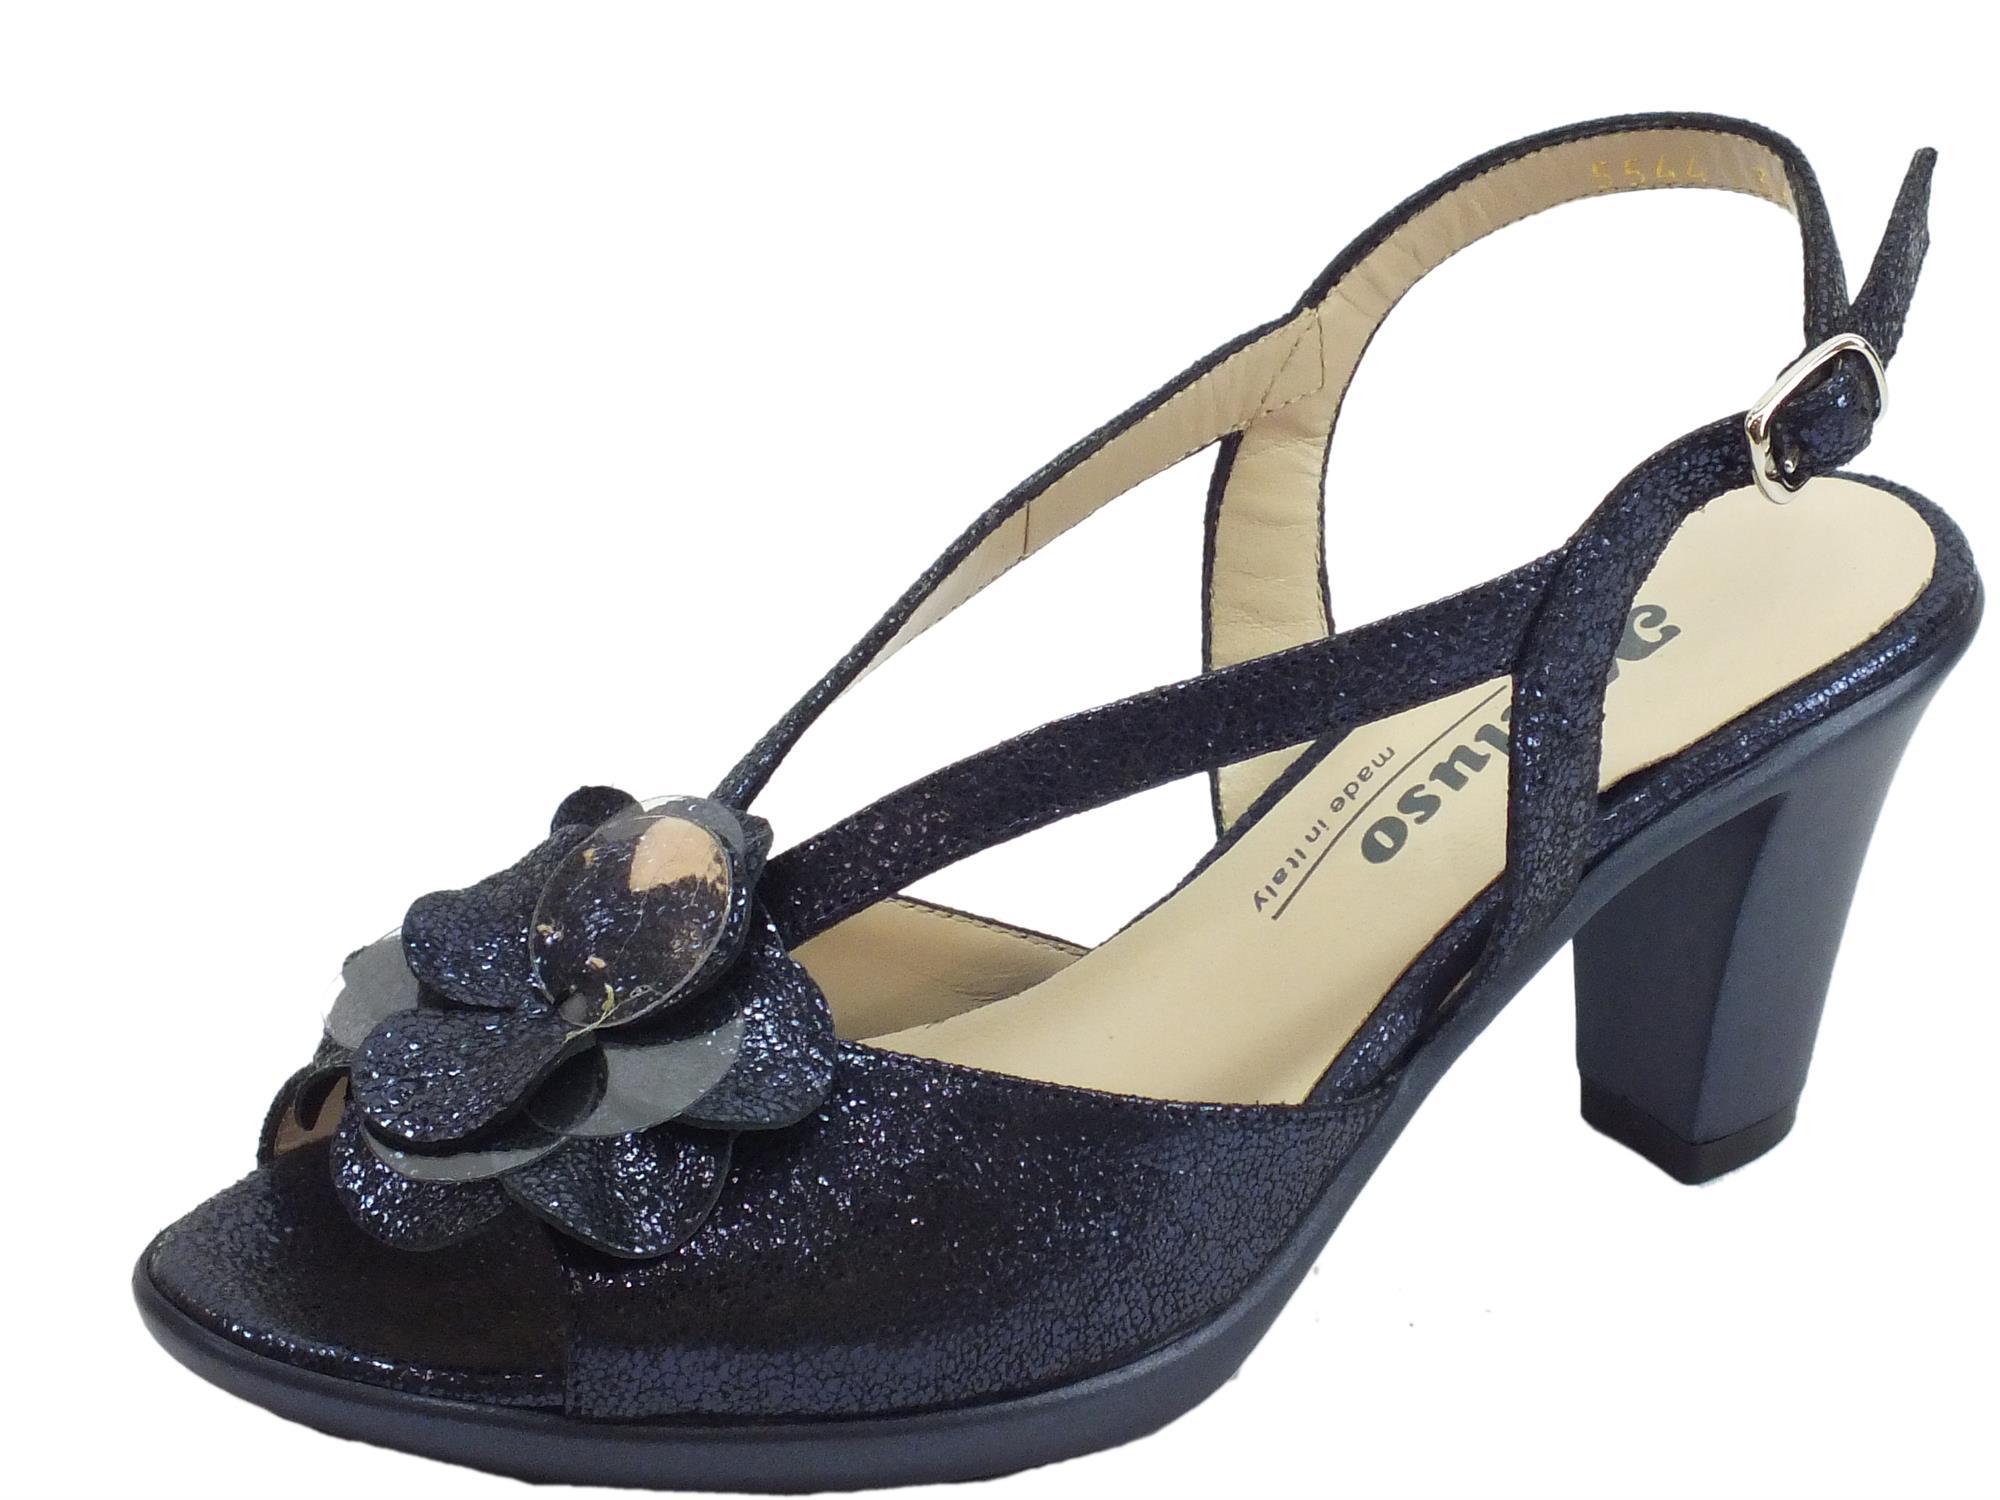 SCARPE CERIMONIA DONNA BLU sandali tacco medio cuoio made in